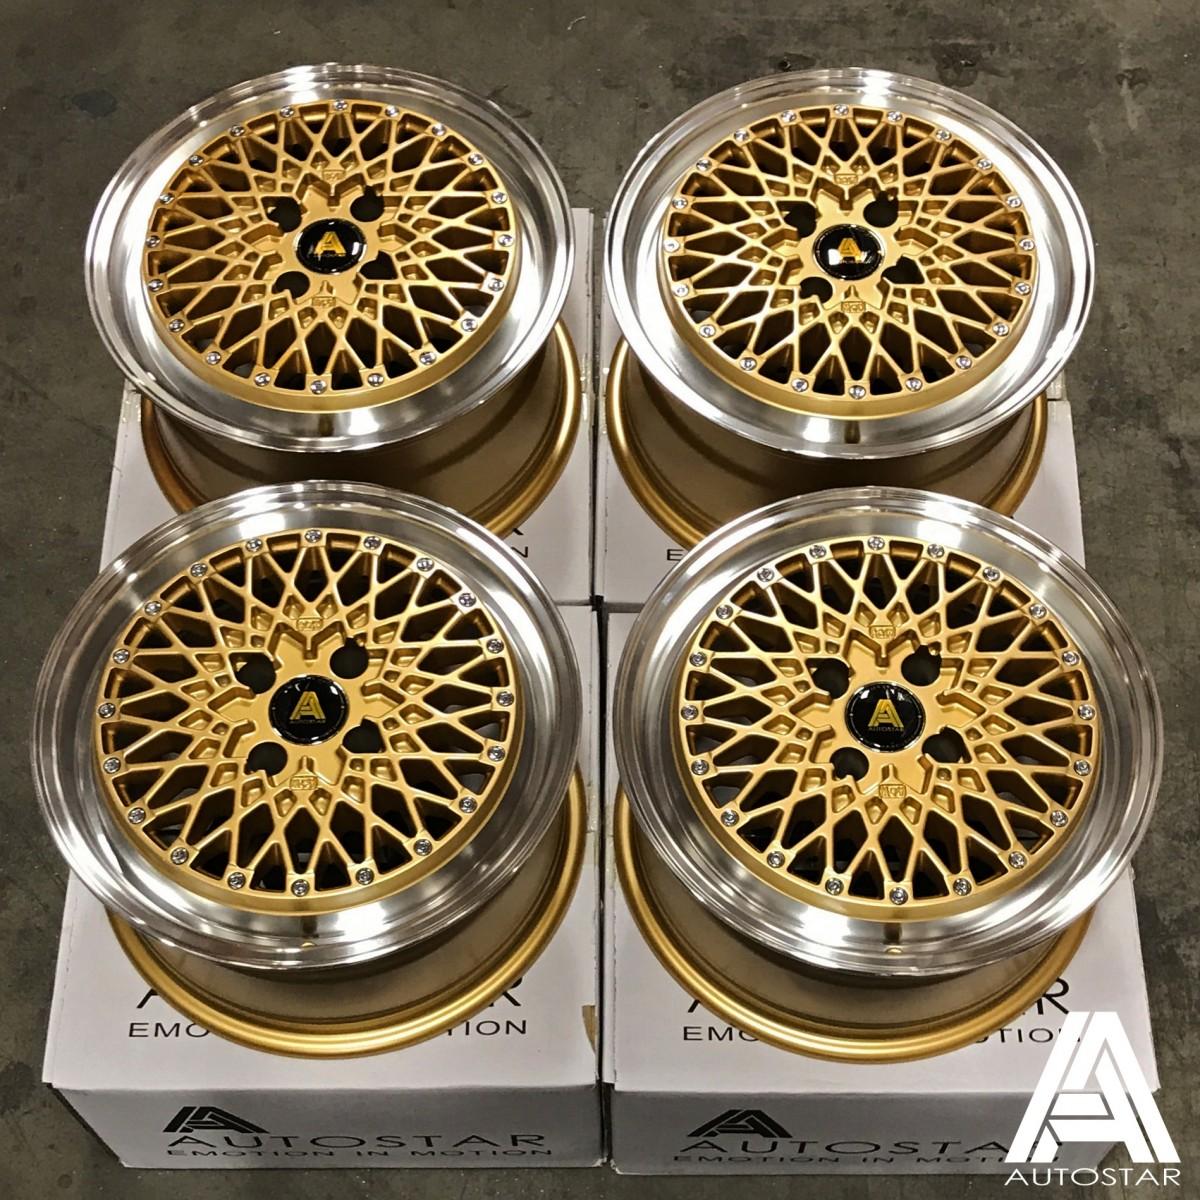 AutoStar Minus 15x7.5 4x108 ET25 Polished with Gold Centre - Set of 4